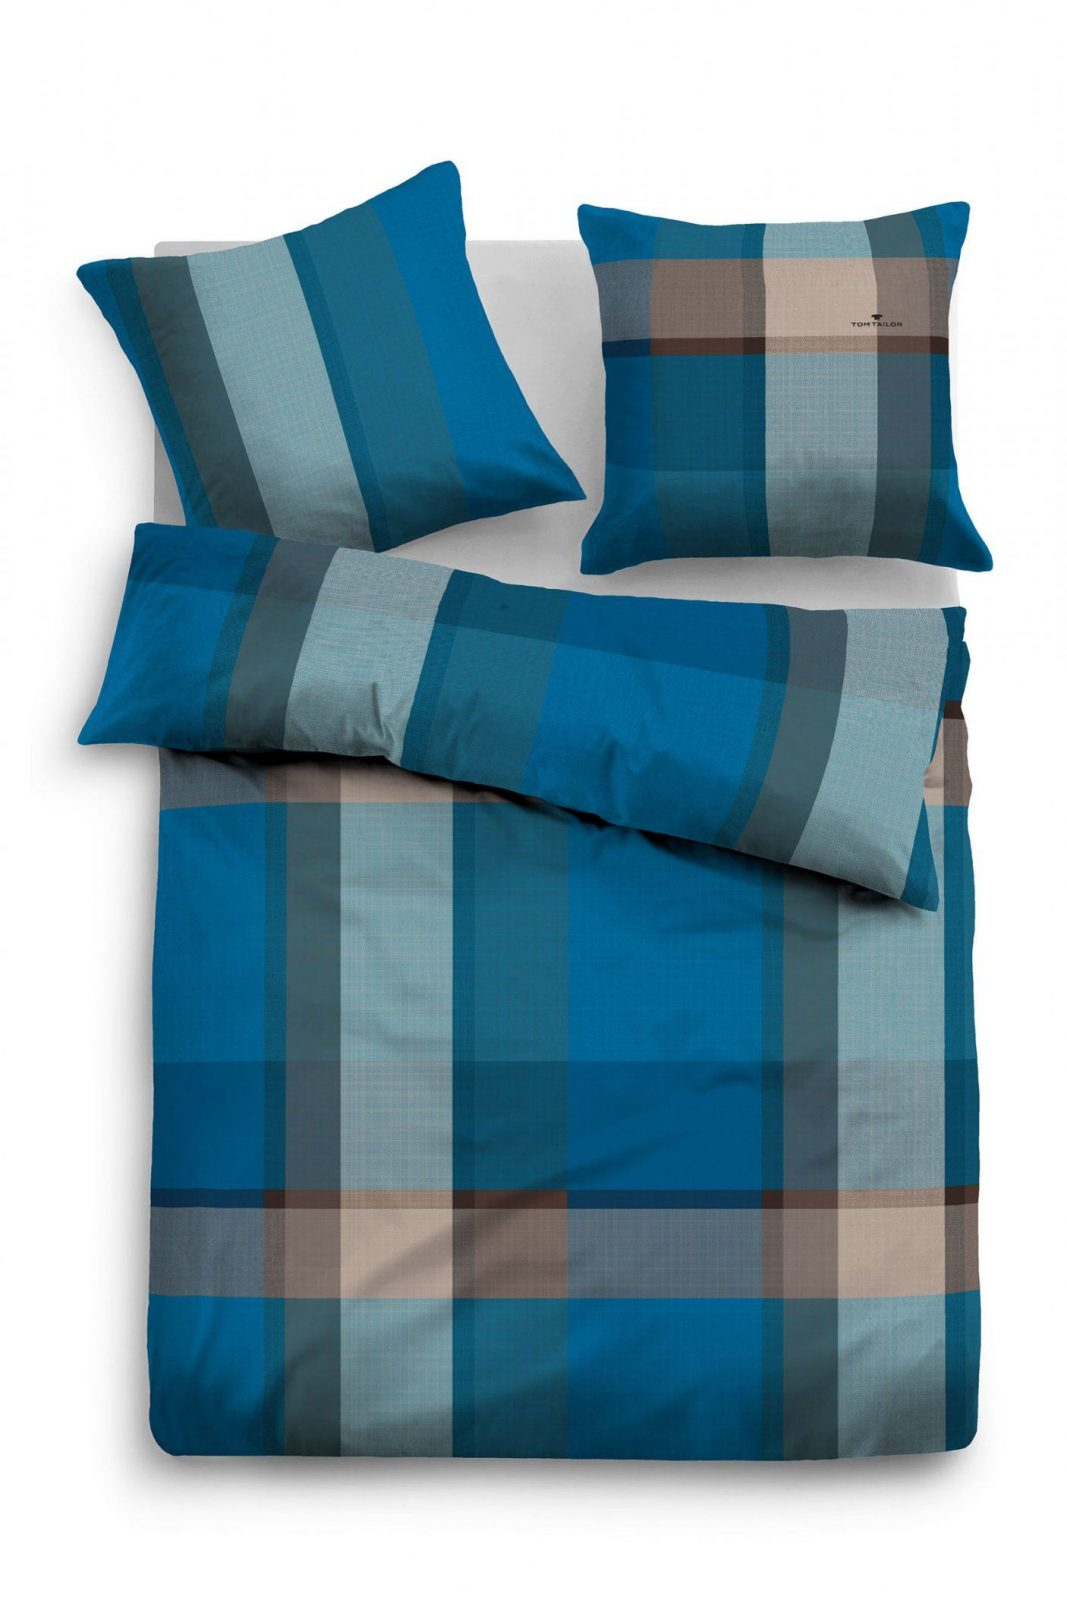 "Tom Tailor Flanell Bettwäsche ""blue Plaid"" Blaugrau  Beauty von Tom Tailor Biber Bettwäsche Bild"